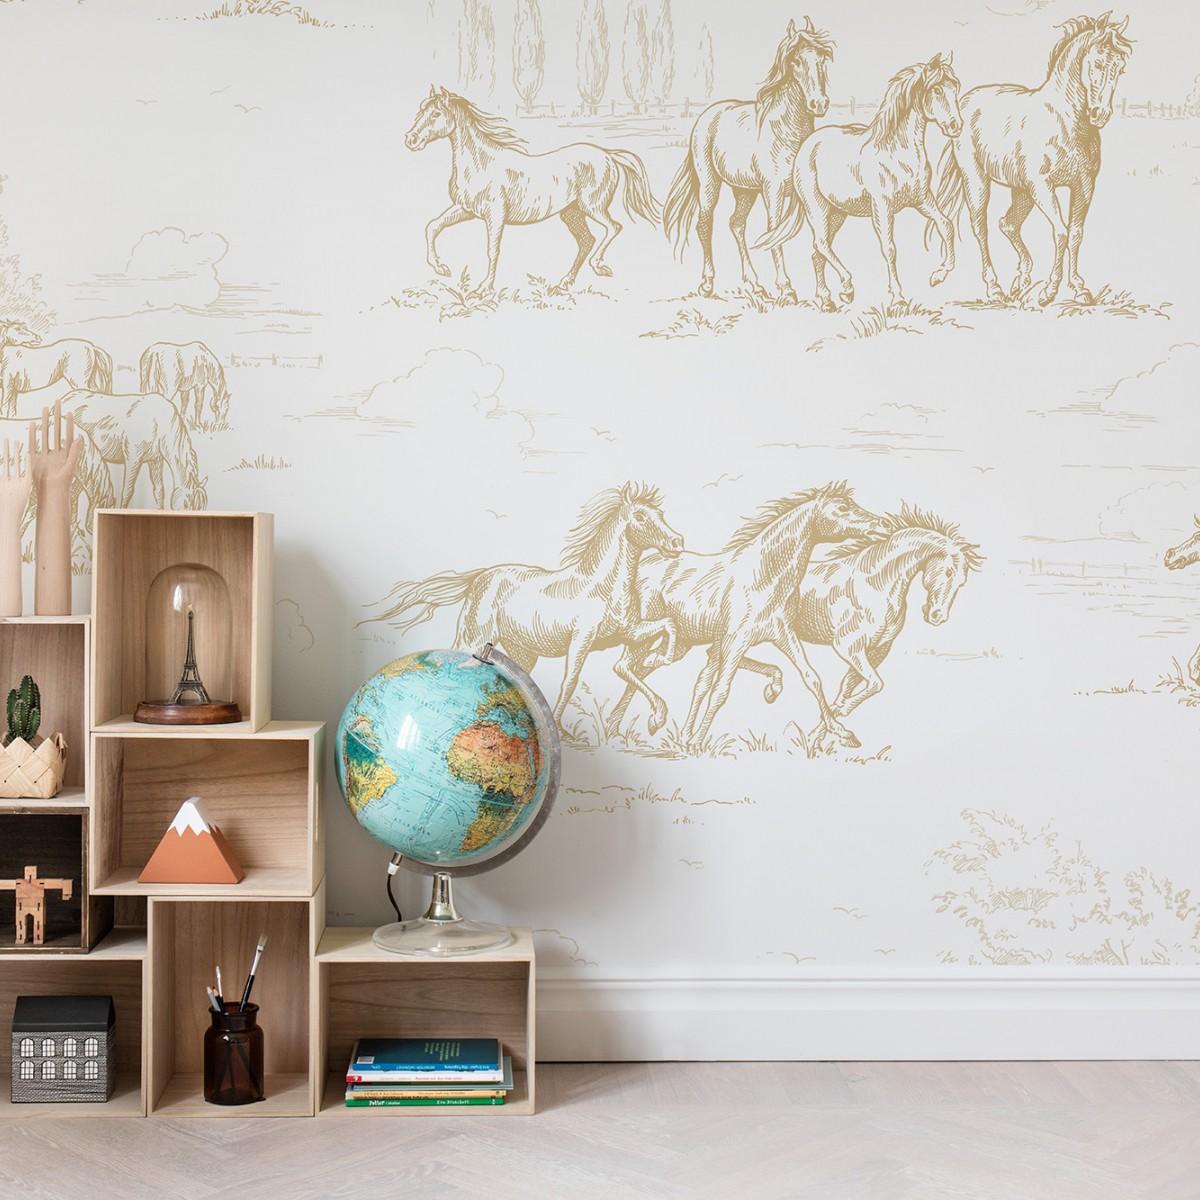 Fototapet Herghelie de cai, Gold, personalizat, Rebel Walls